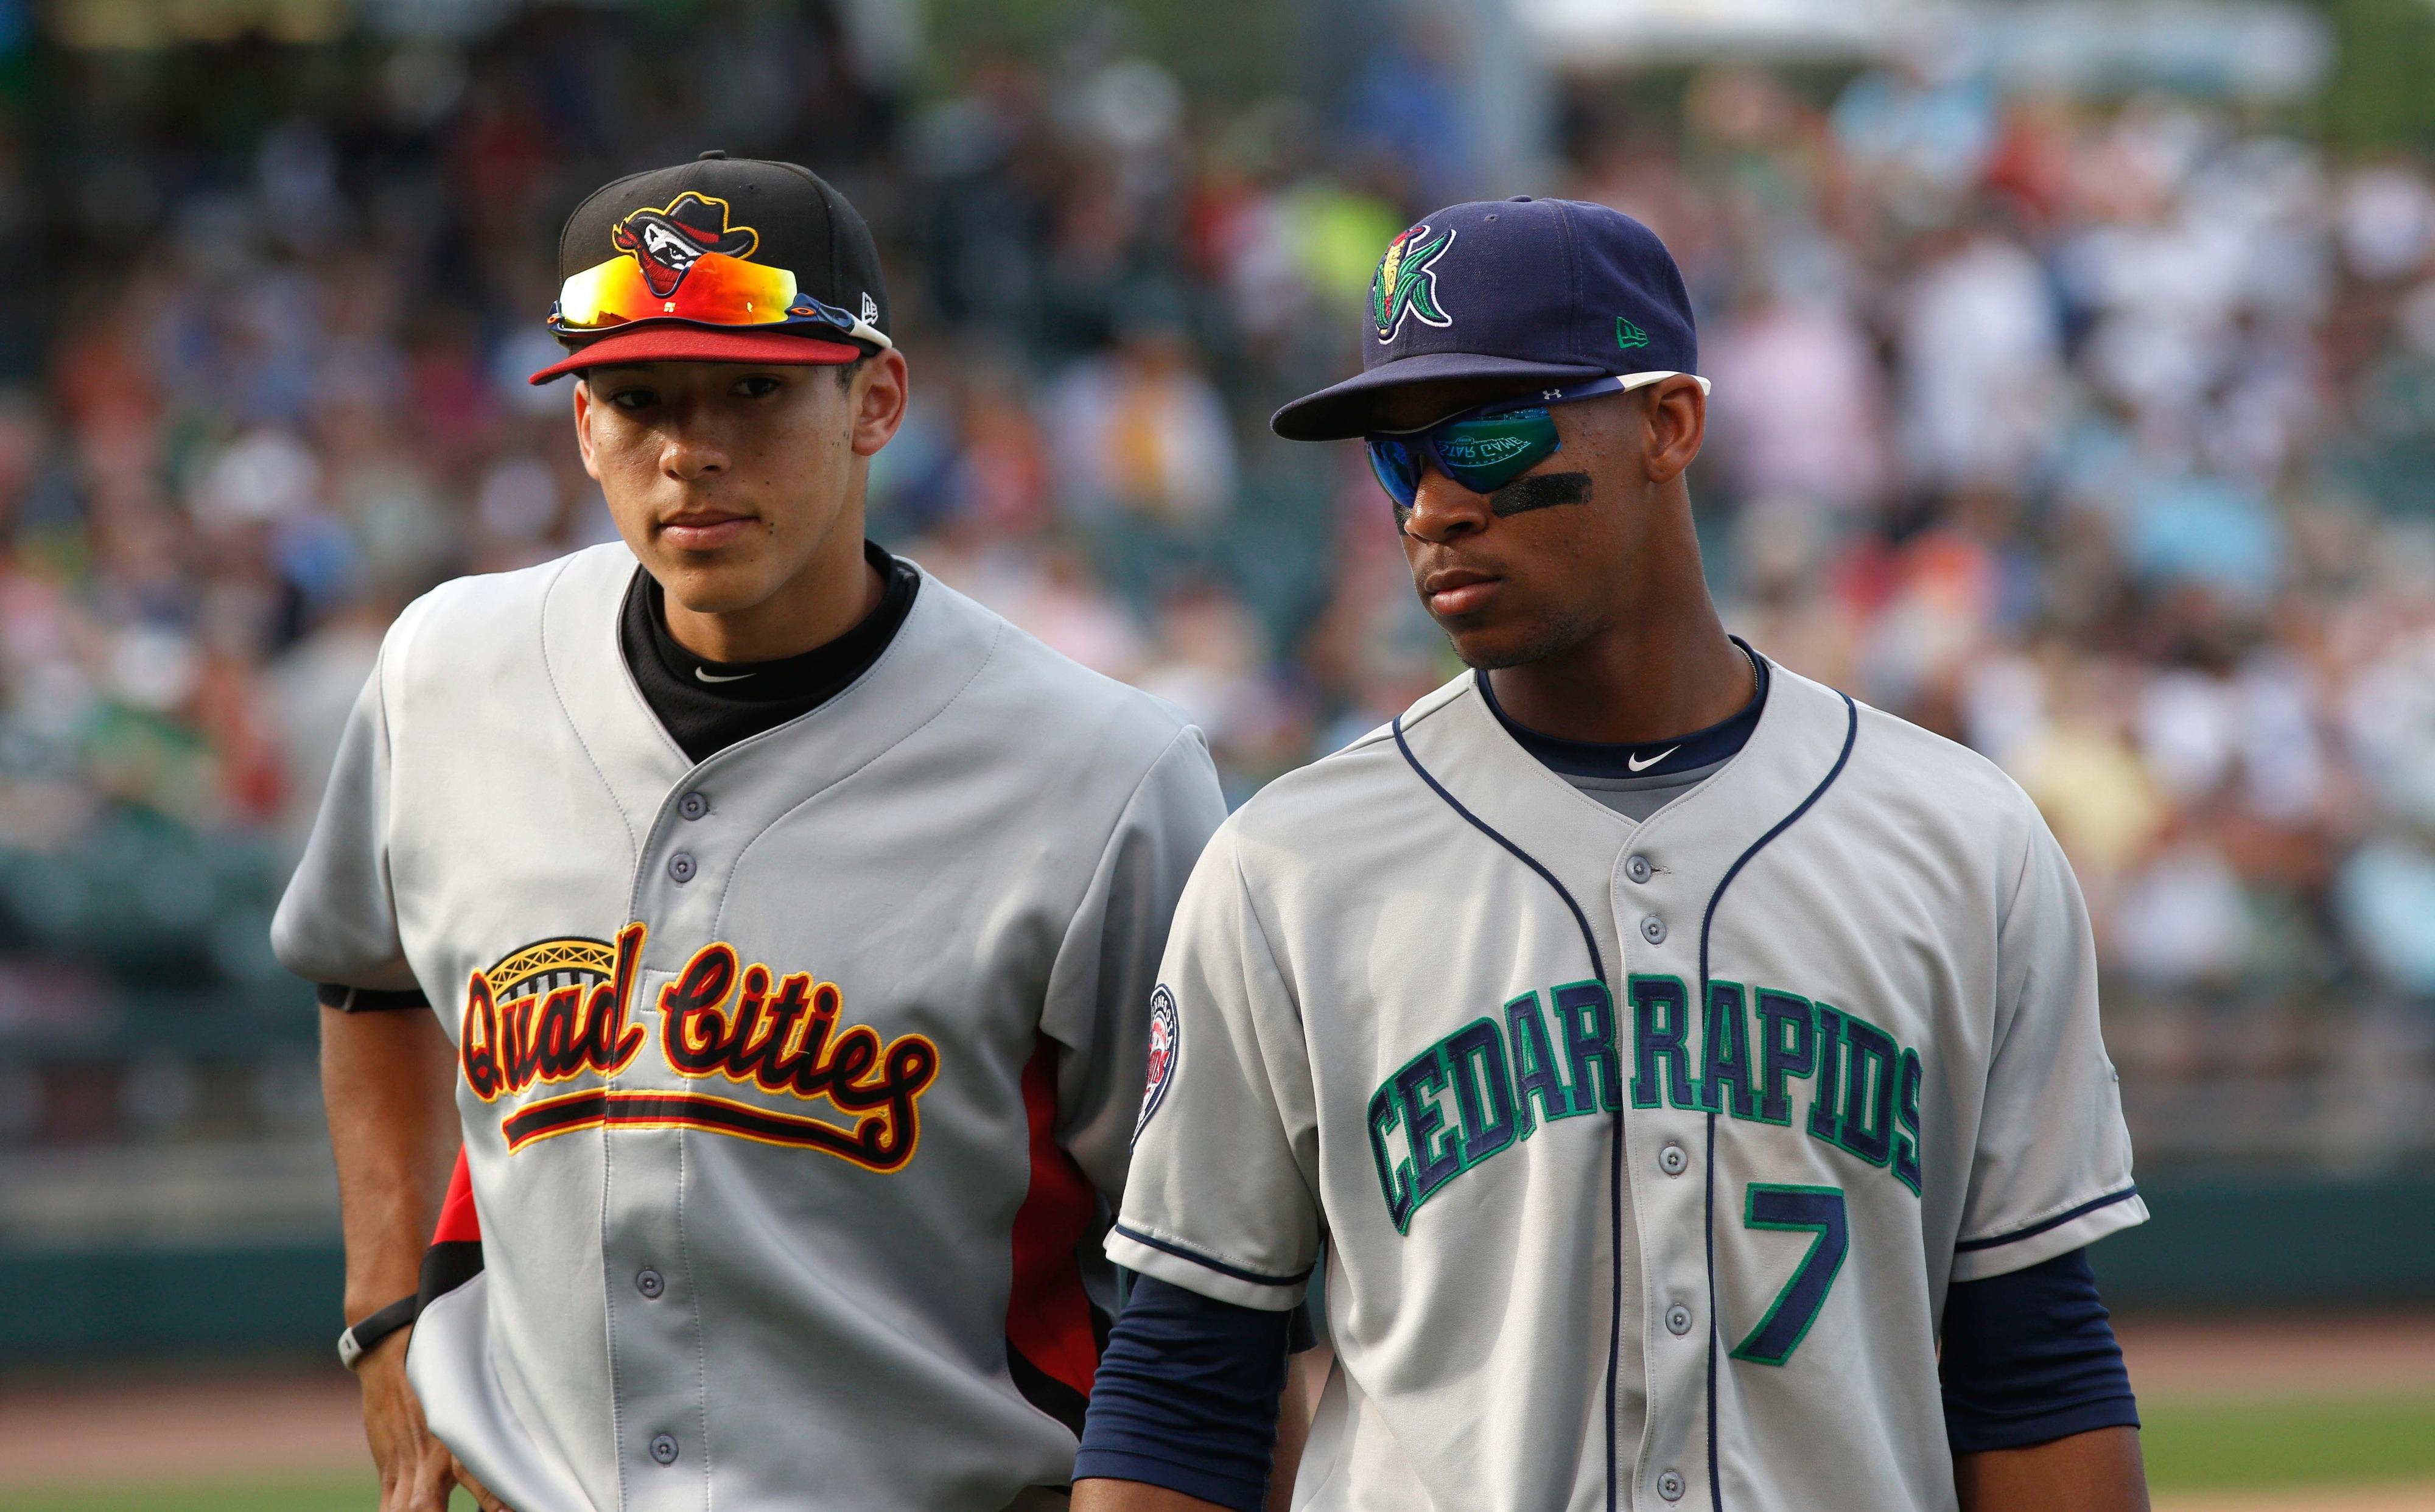 Carlos Correa and Byron Buxton